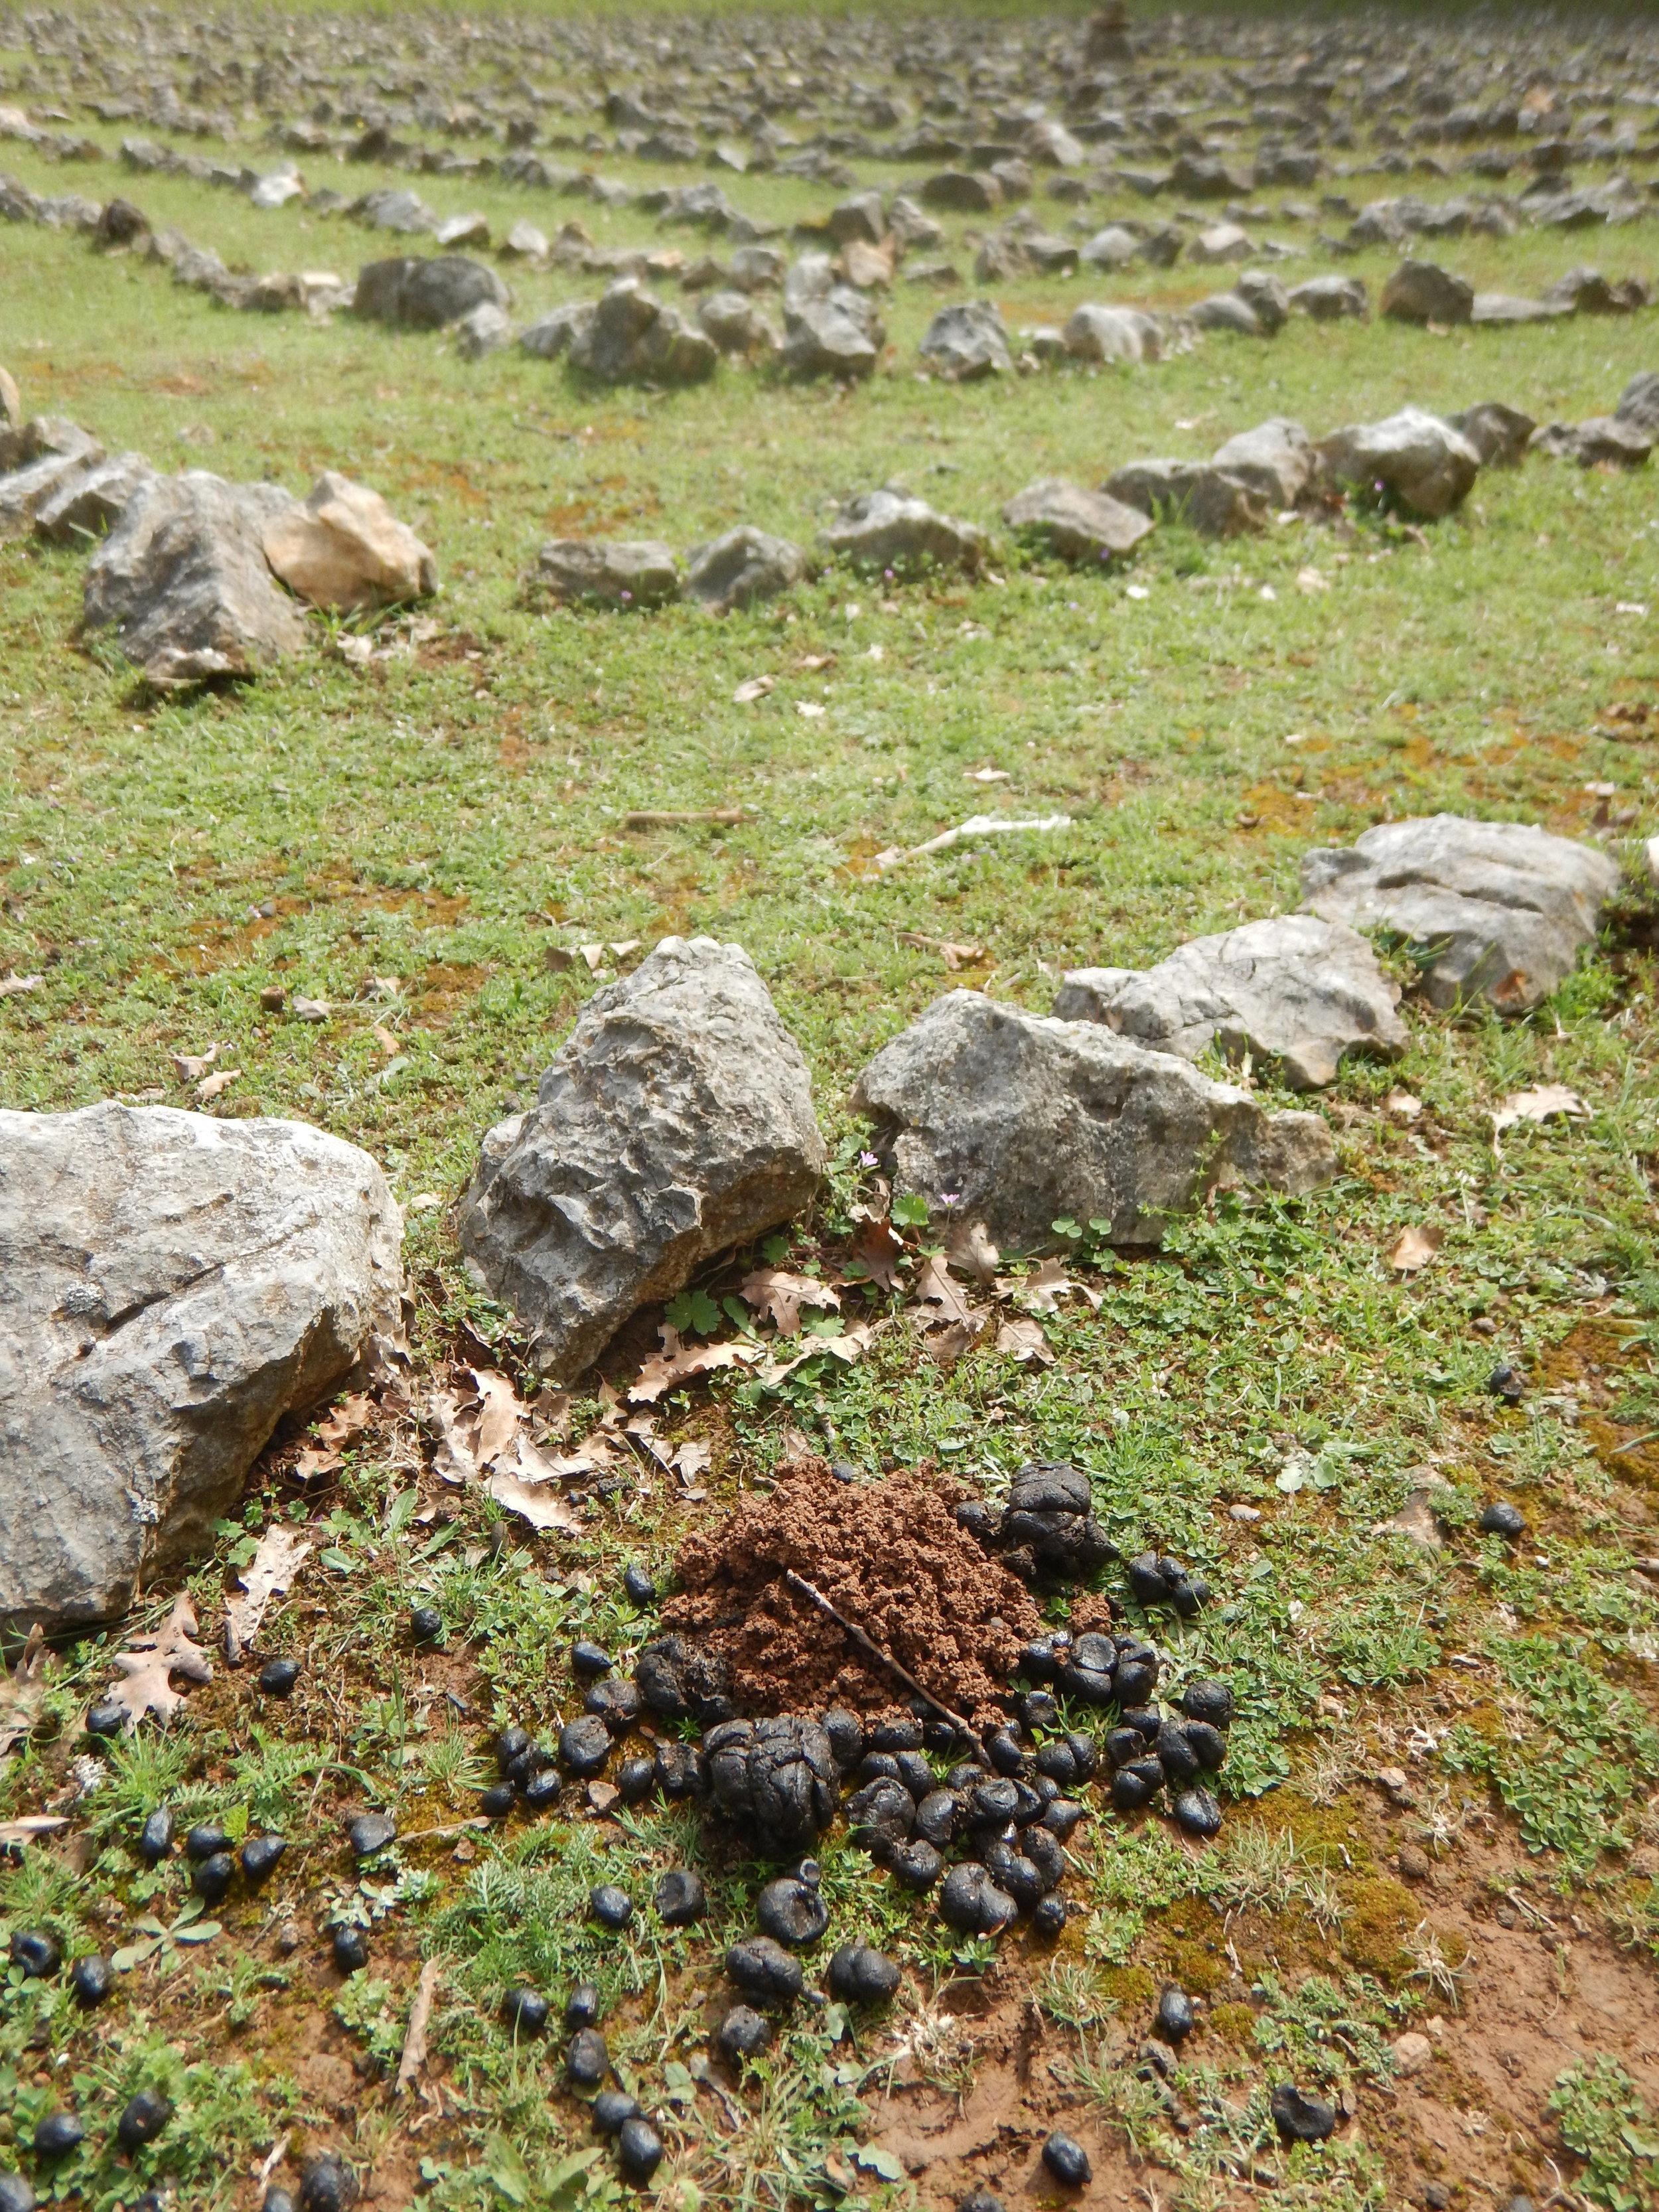 Dung beetles at work